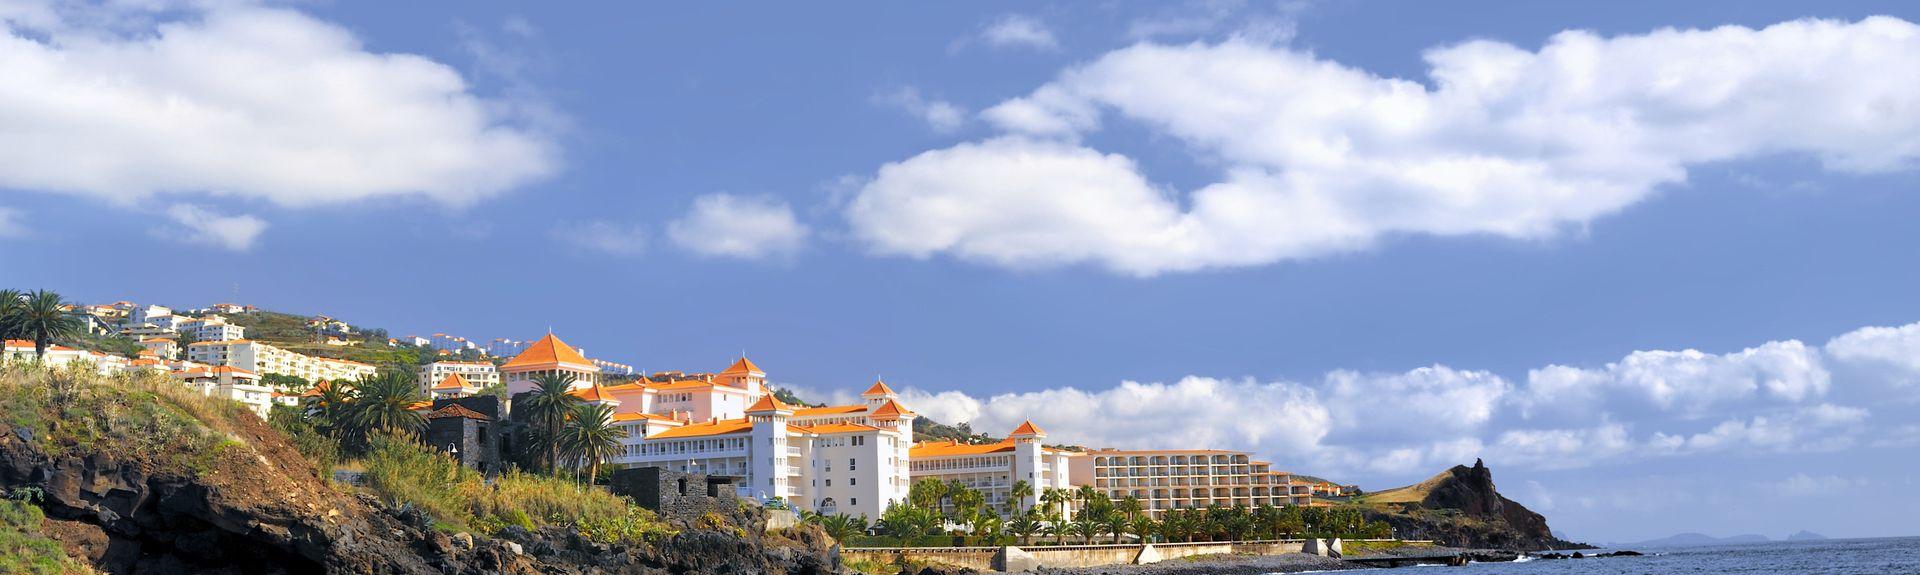 Canico, Madeira-regionen, Portugal